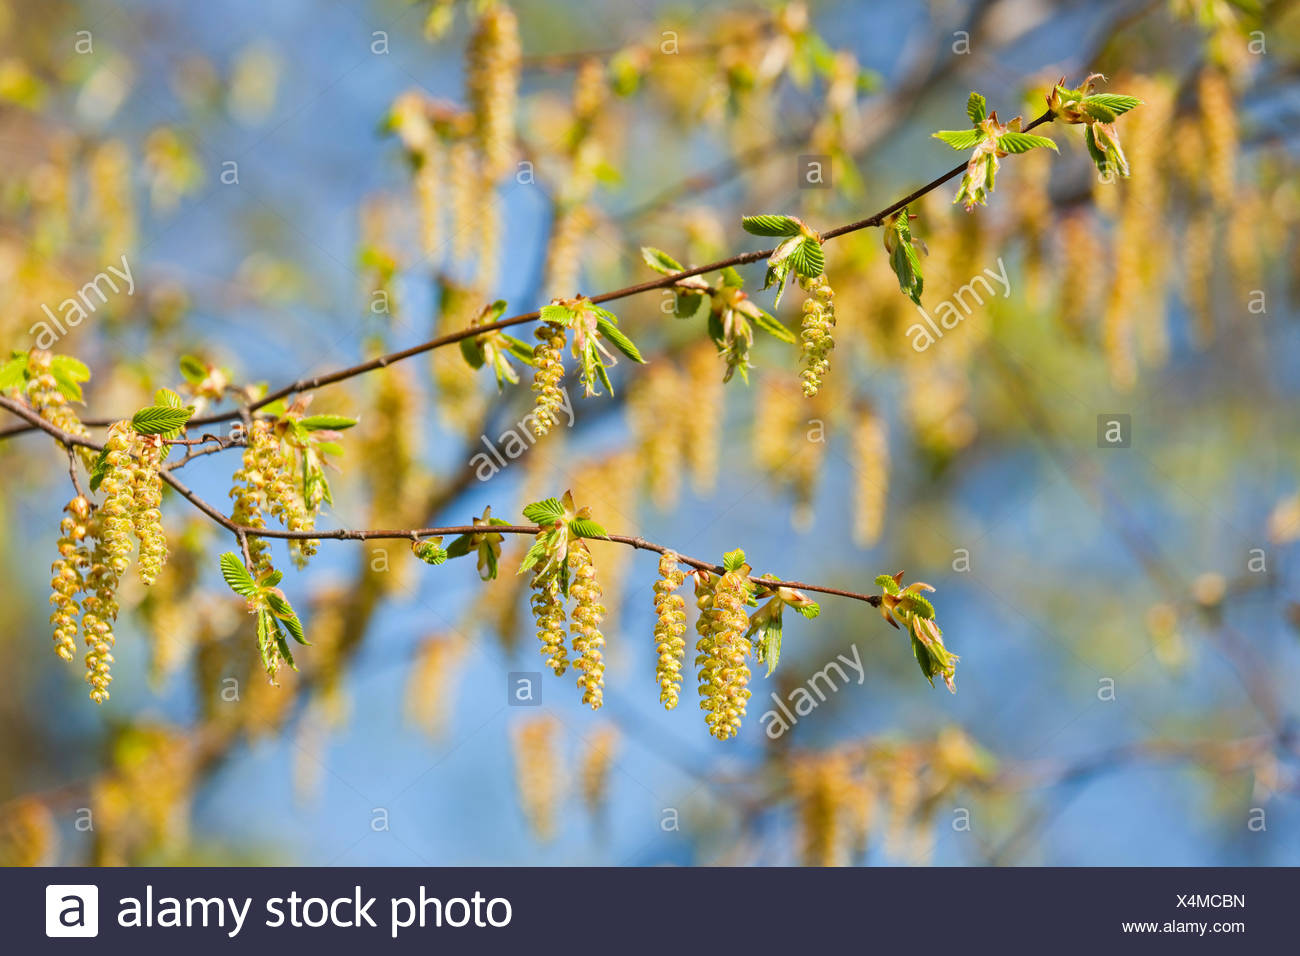 European Hornbeam (Carpinus betulus), male inflorescences, Lower Saxony, Germany - Stock Image